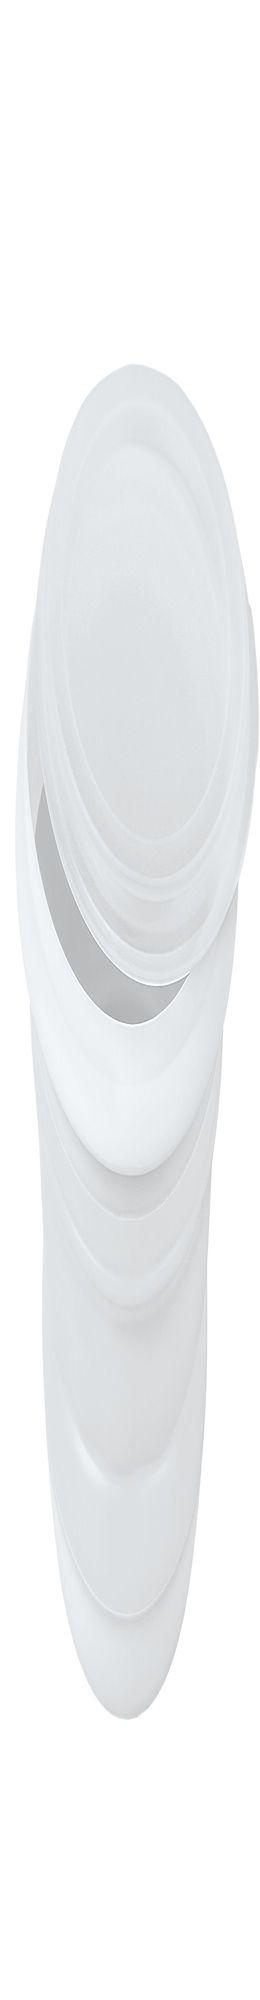 Ланчбокс Base, белый фото